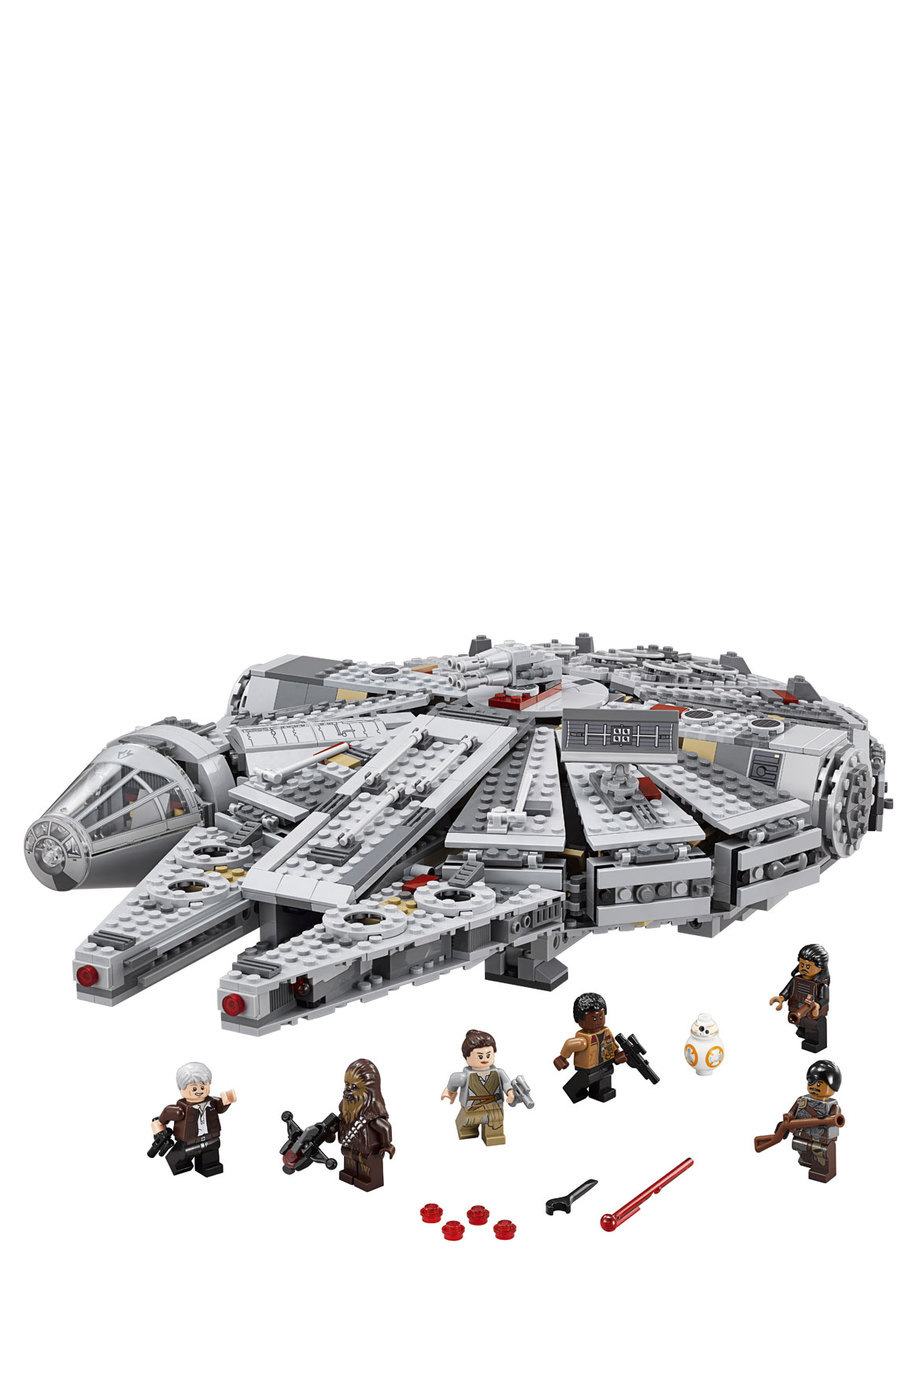 Lego Star Wars Millennium Falcon 75105 Myer Online